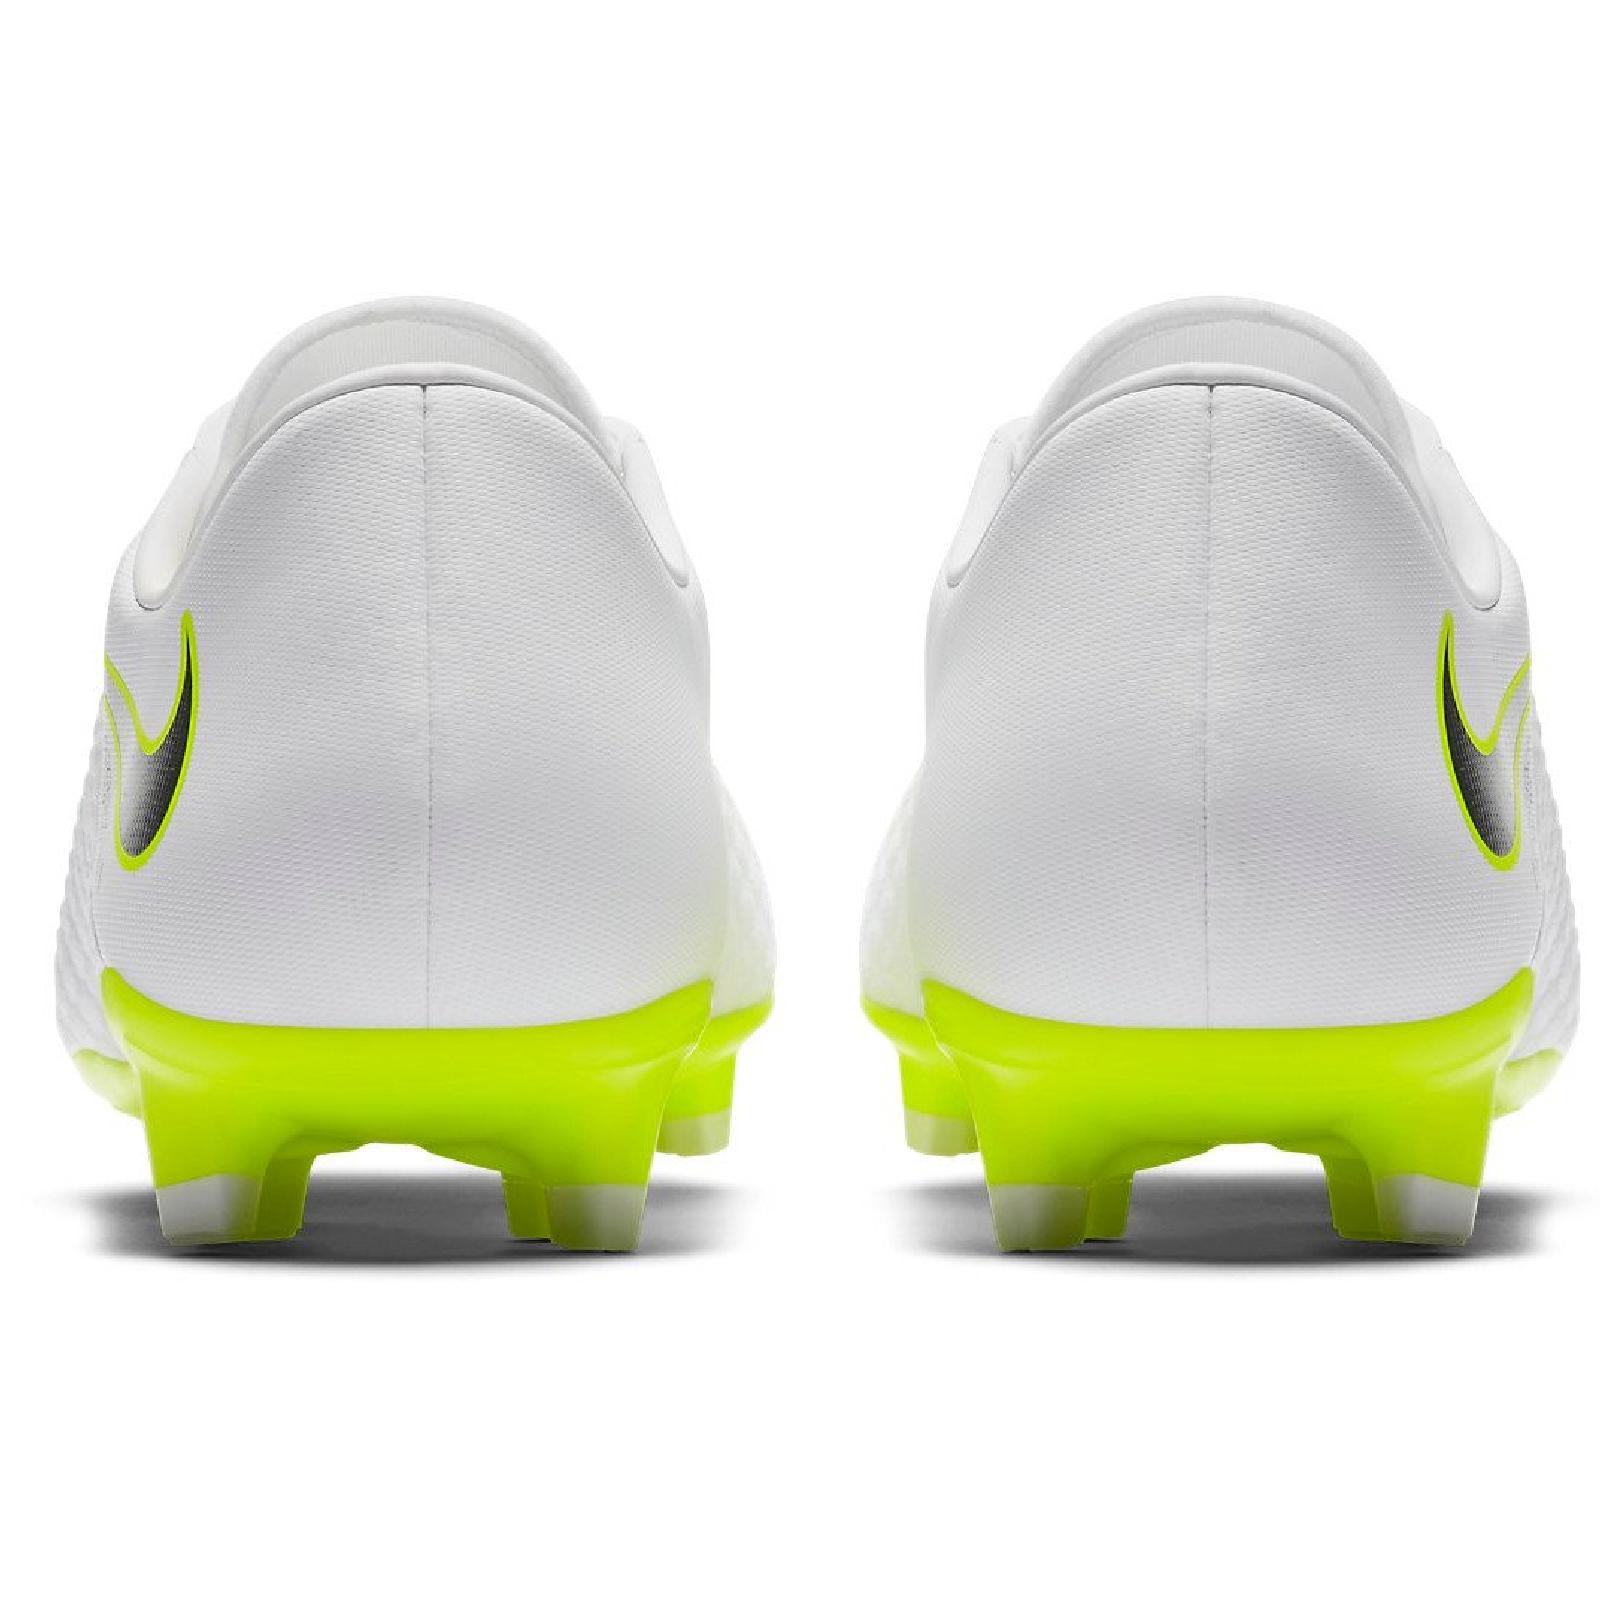 Nike Hypervenom Phantom 3 Academy FG Fußballschuhe weiss/neon AJ4120-107